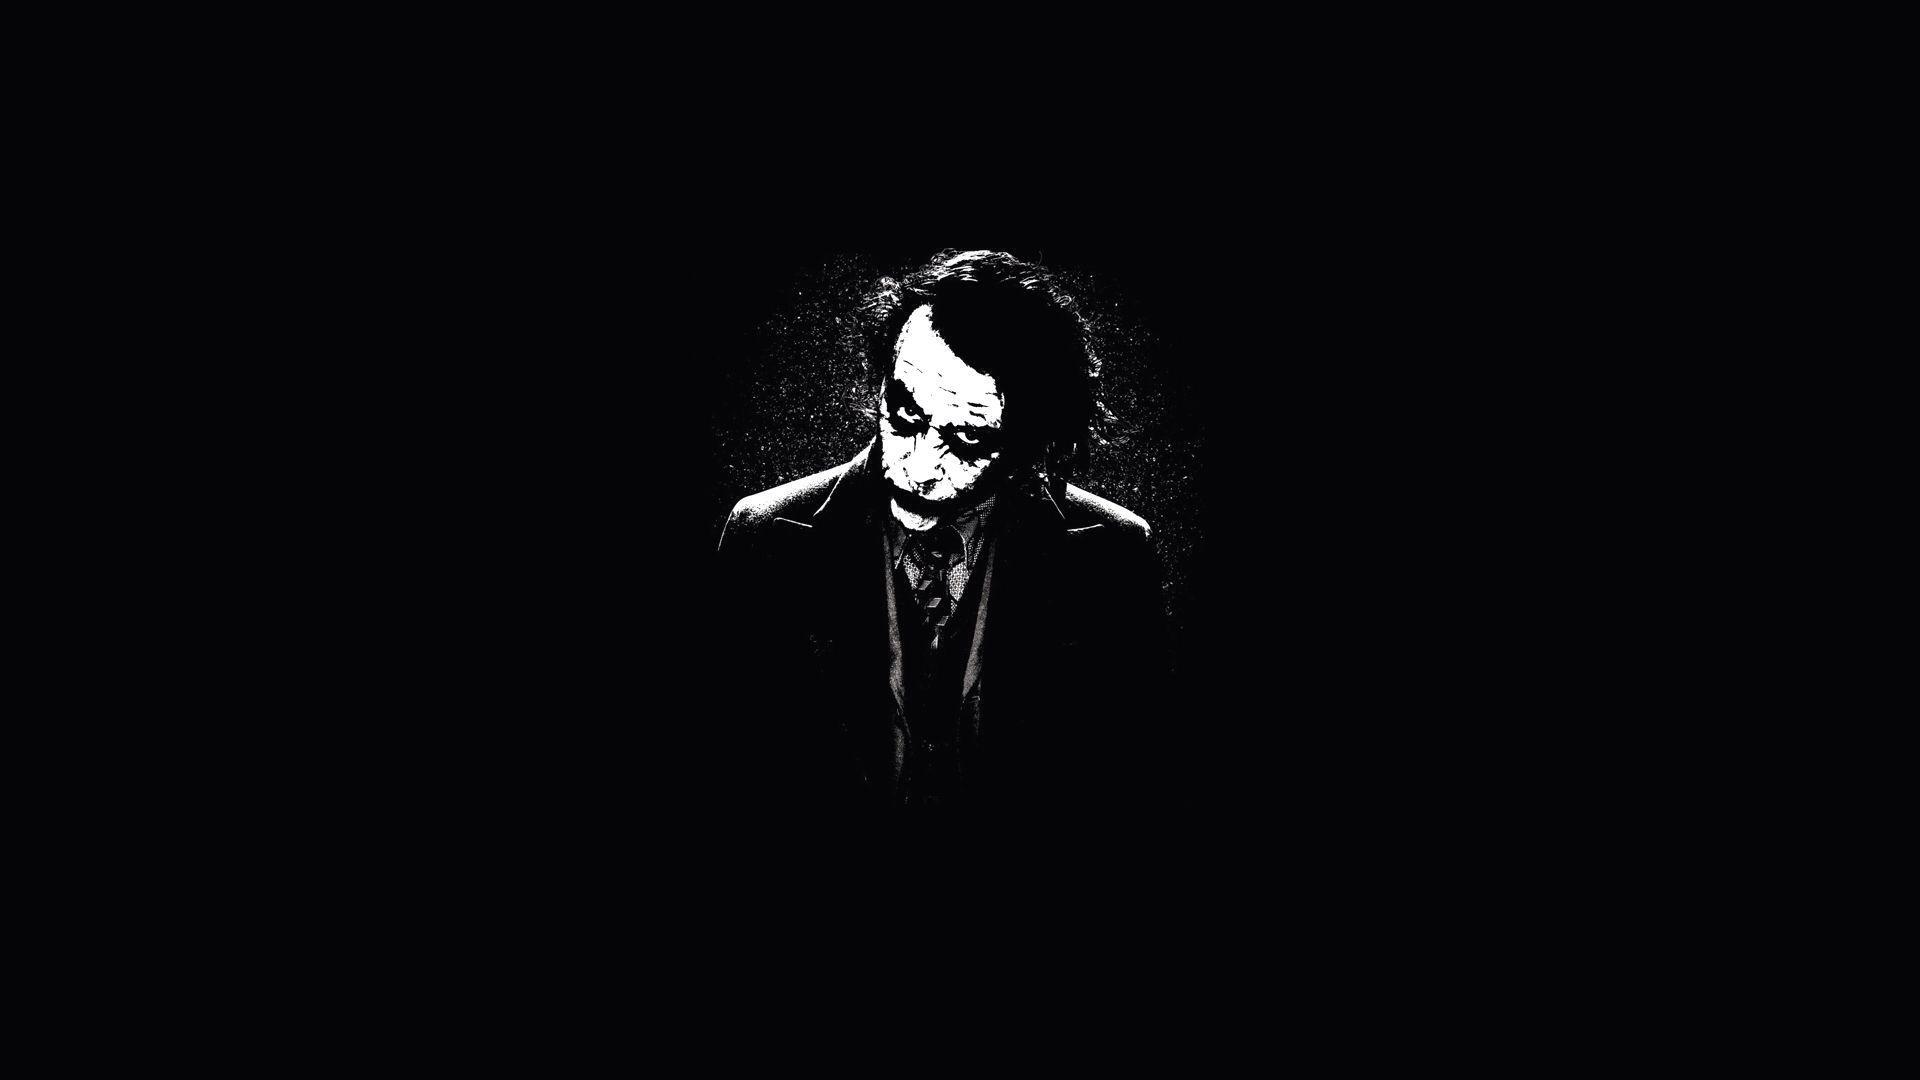 Joker Black Wallpapers Wallpaper Cave